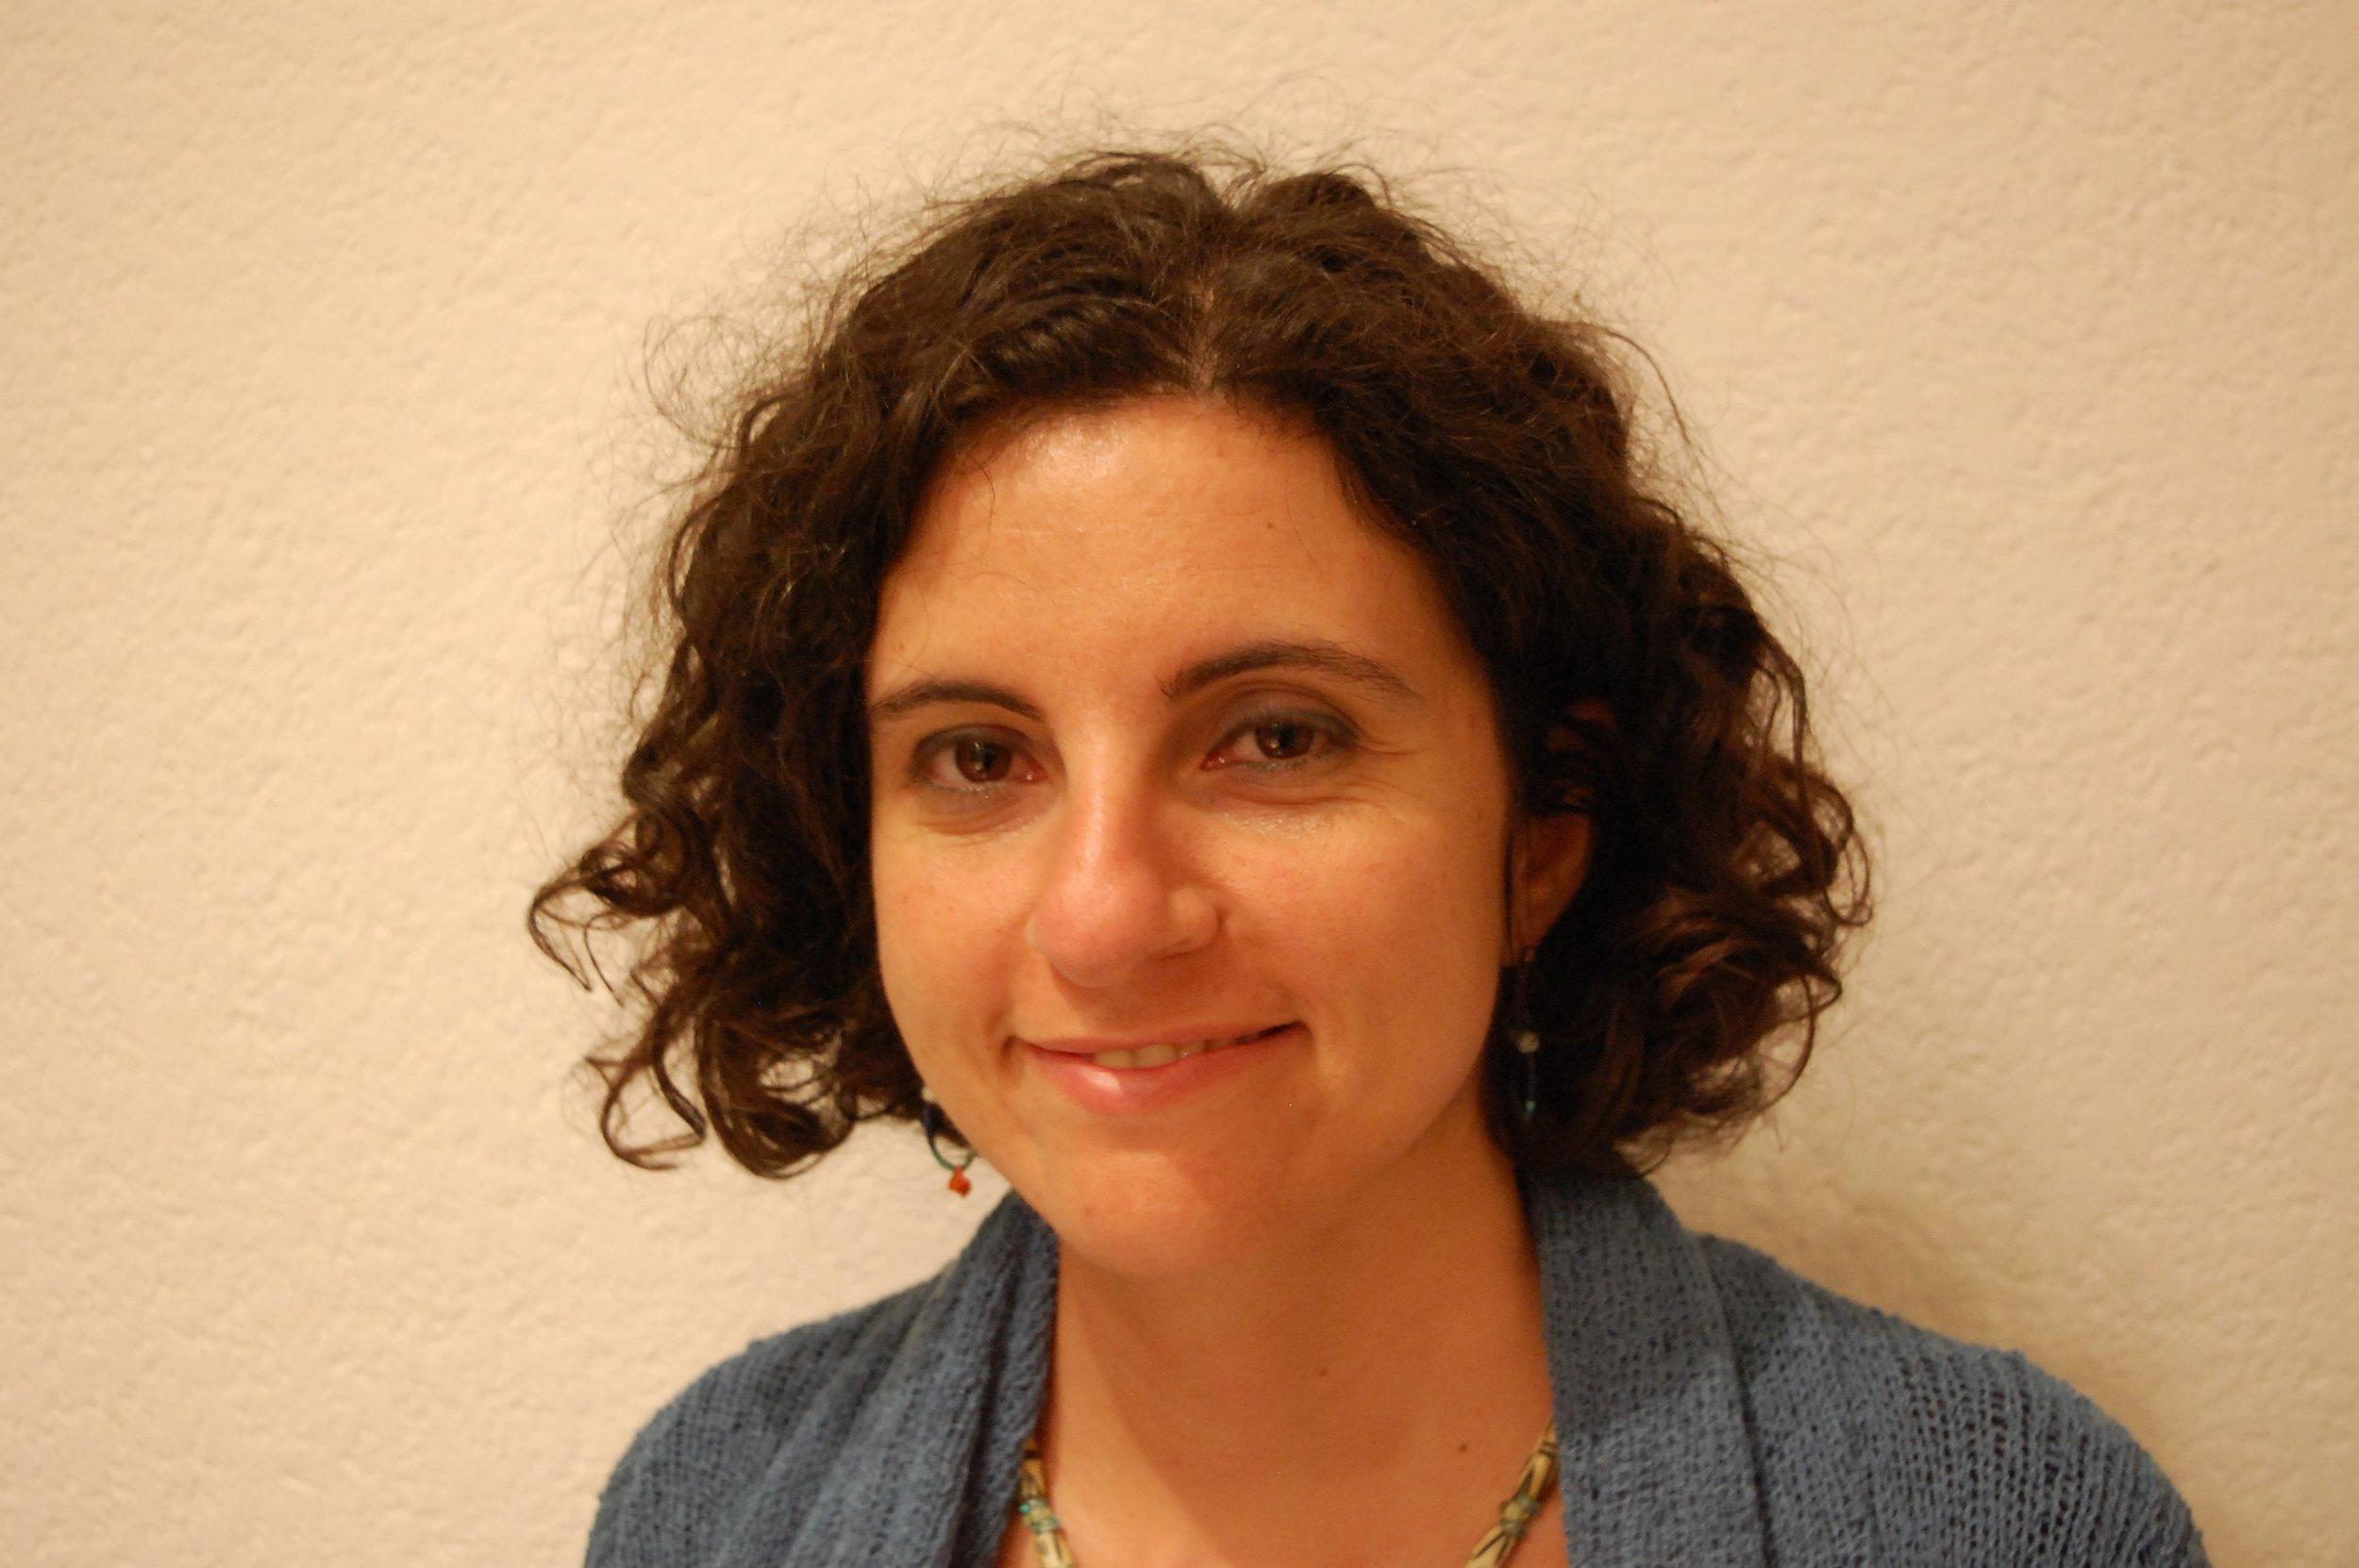 Chiara Liguori picture.jpg